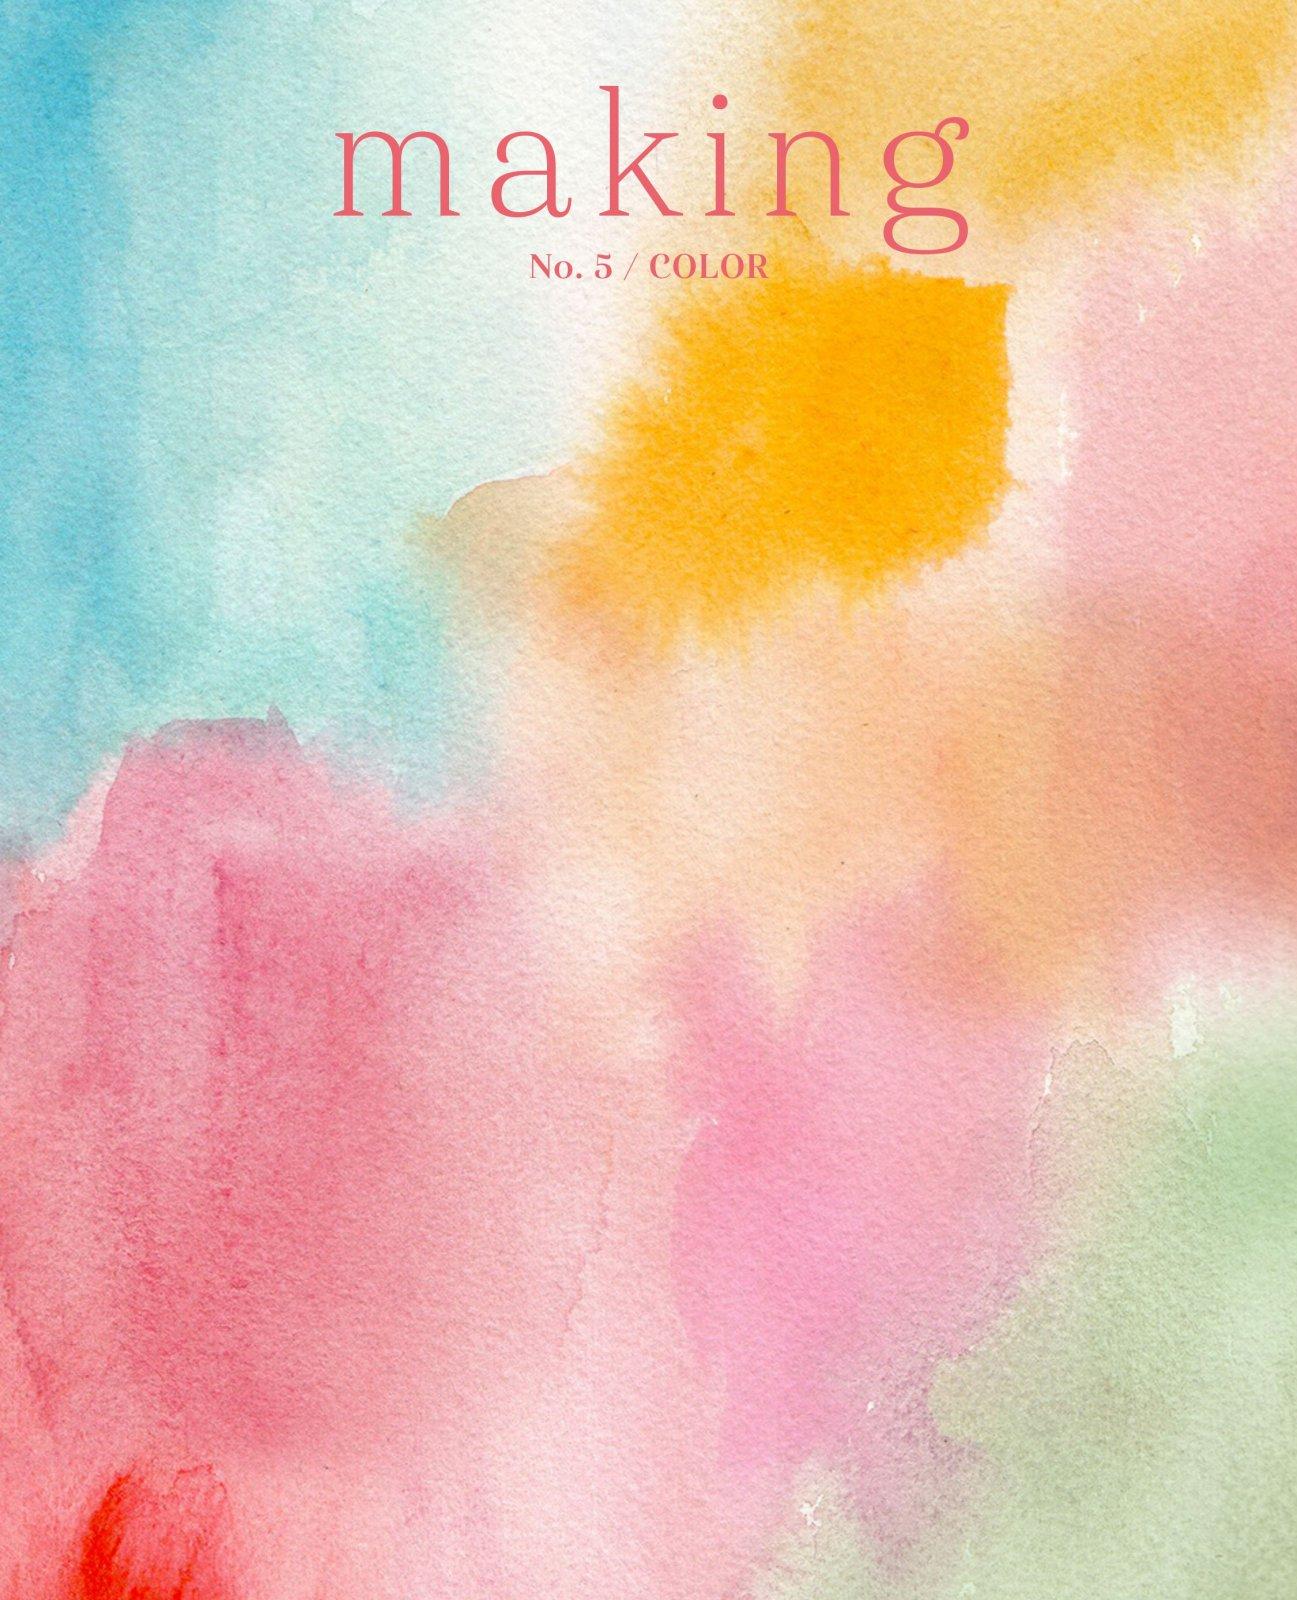 Making No.5 - Color